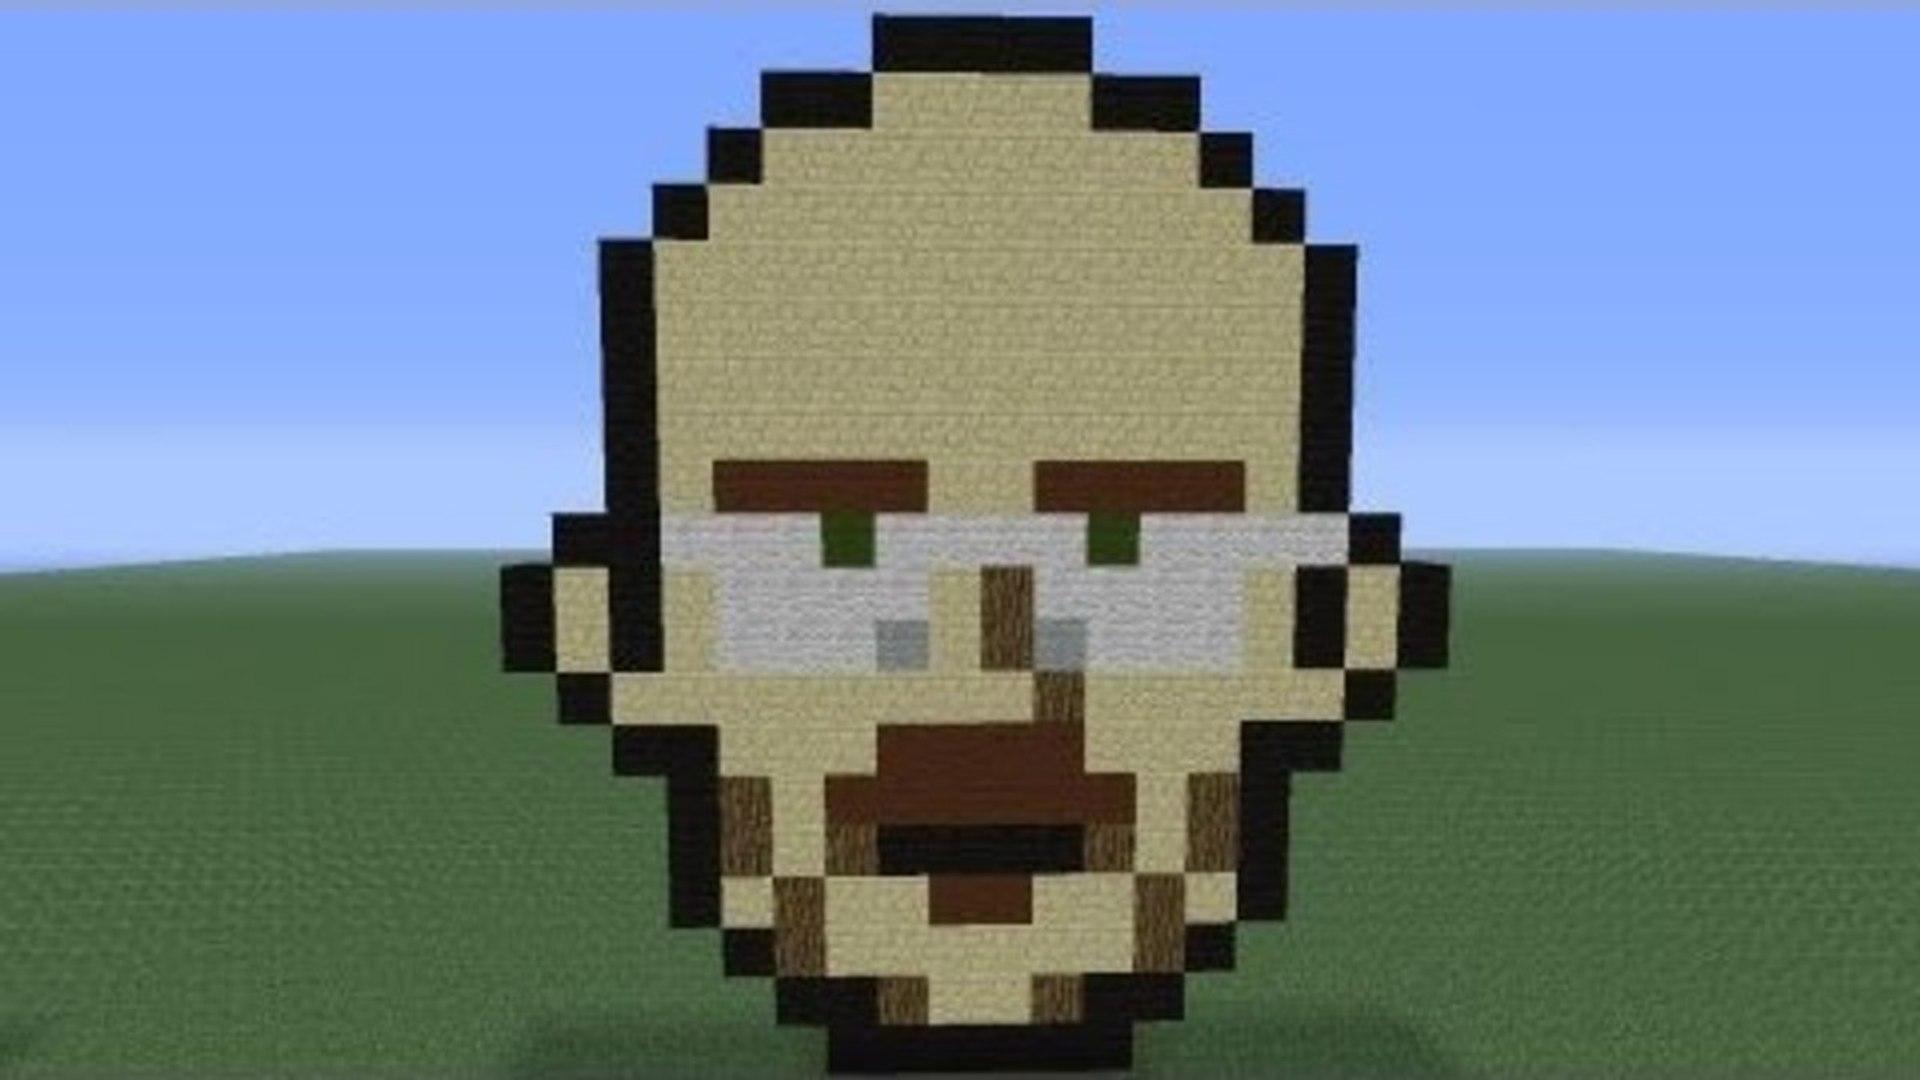 Minecraft Pixel Art Walter White Breaking Bad Tutorial